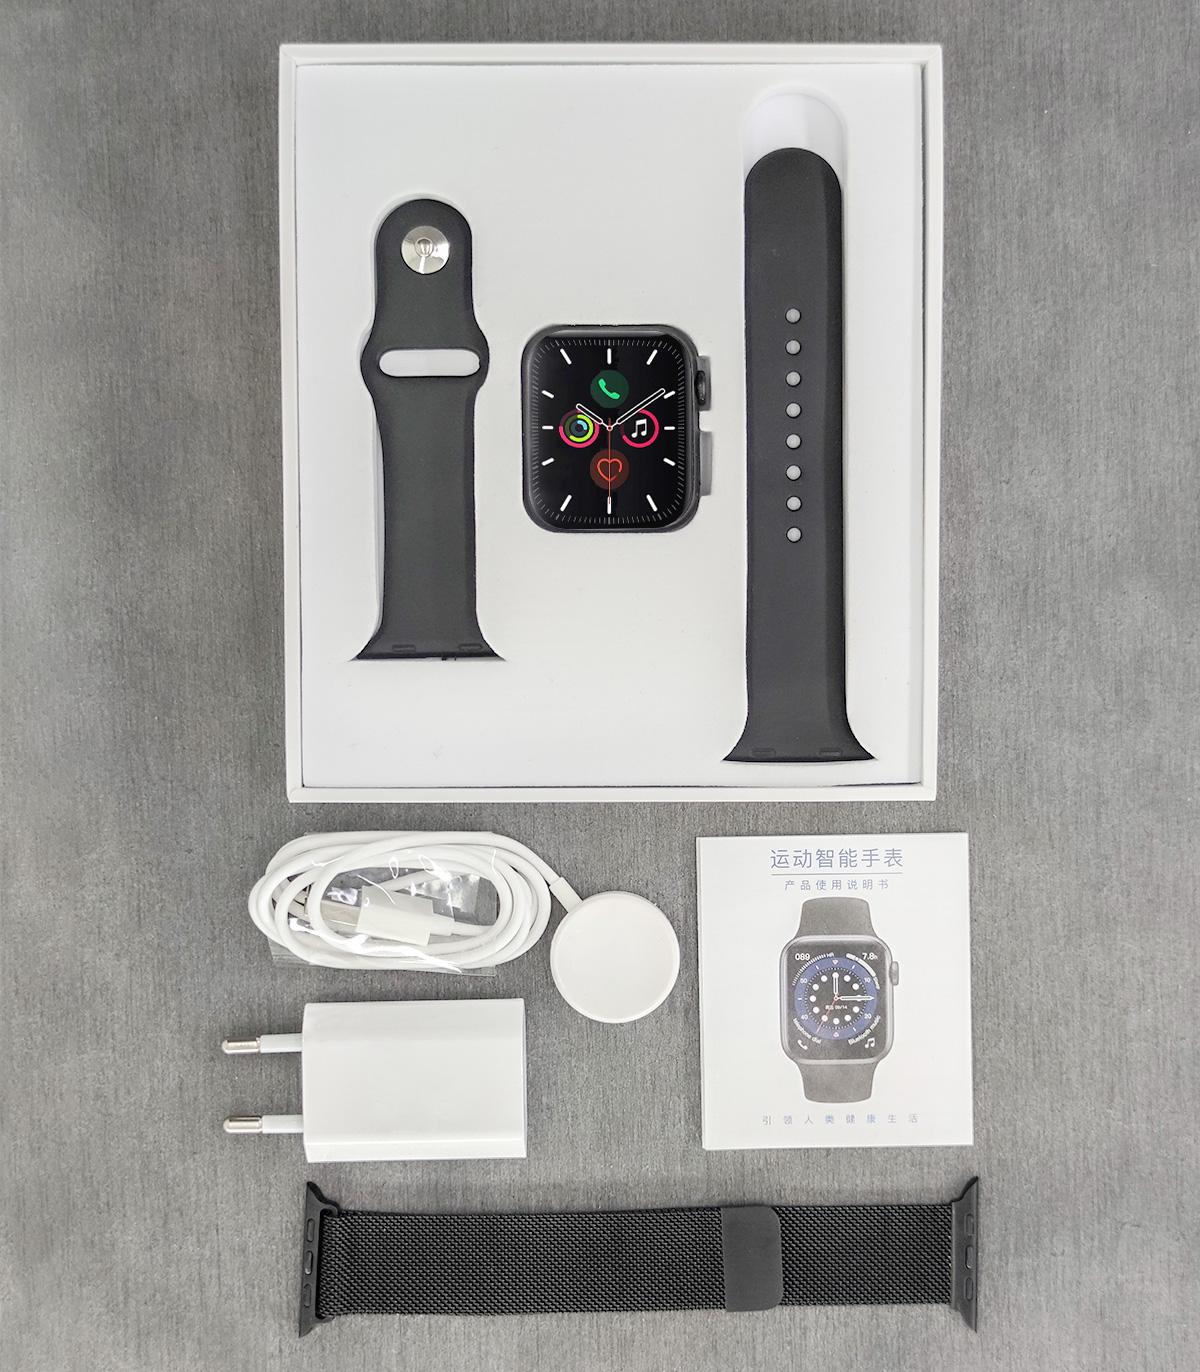 ساعت هوشمند گیفت کالکشن مدل W56